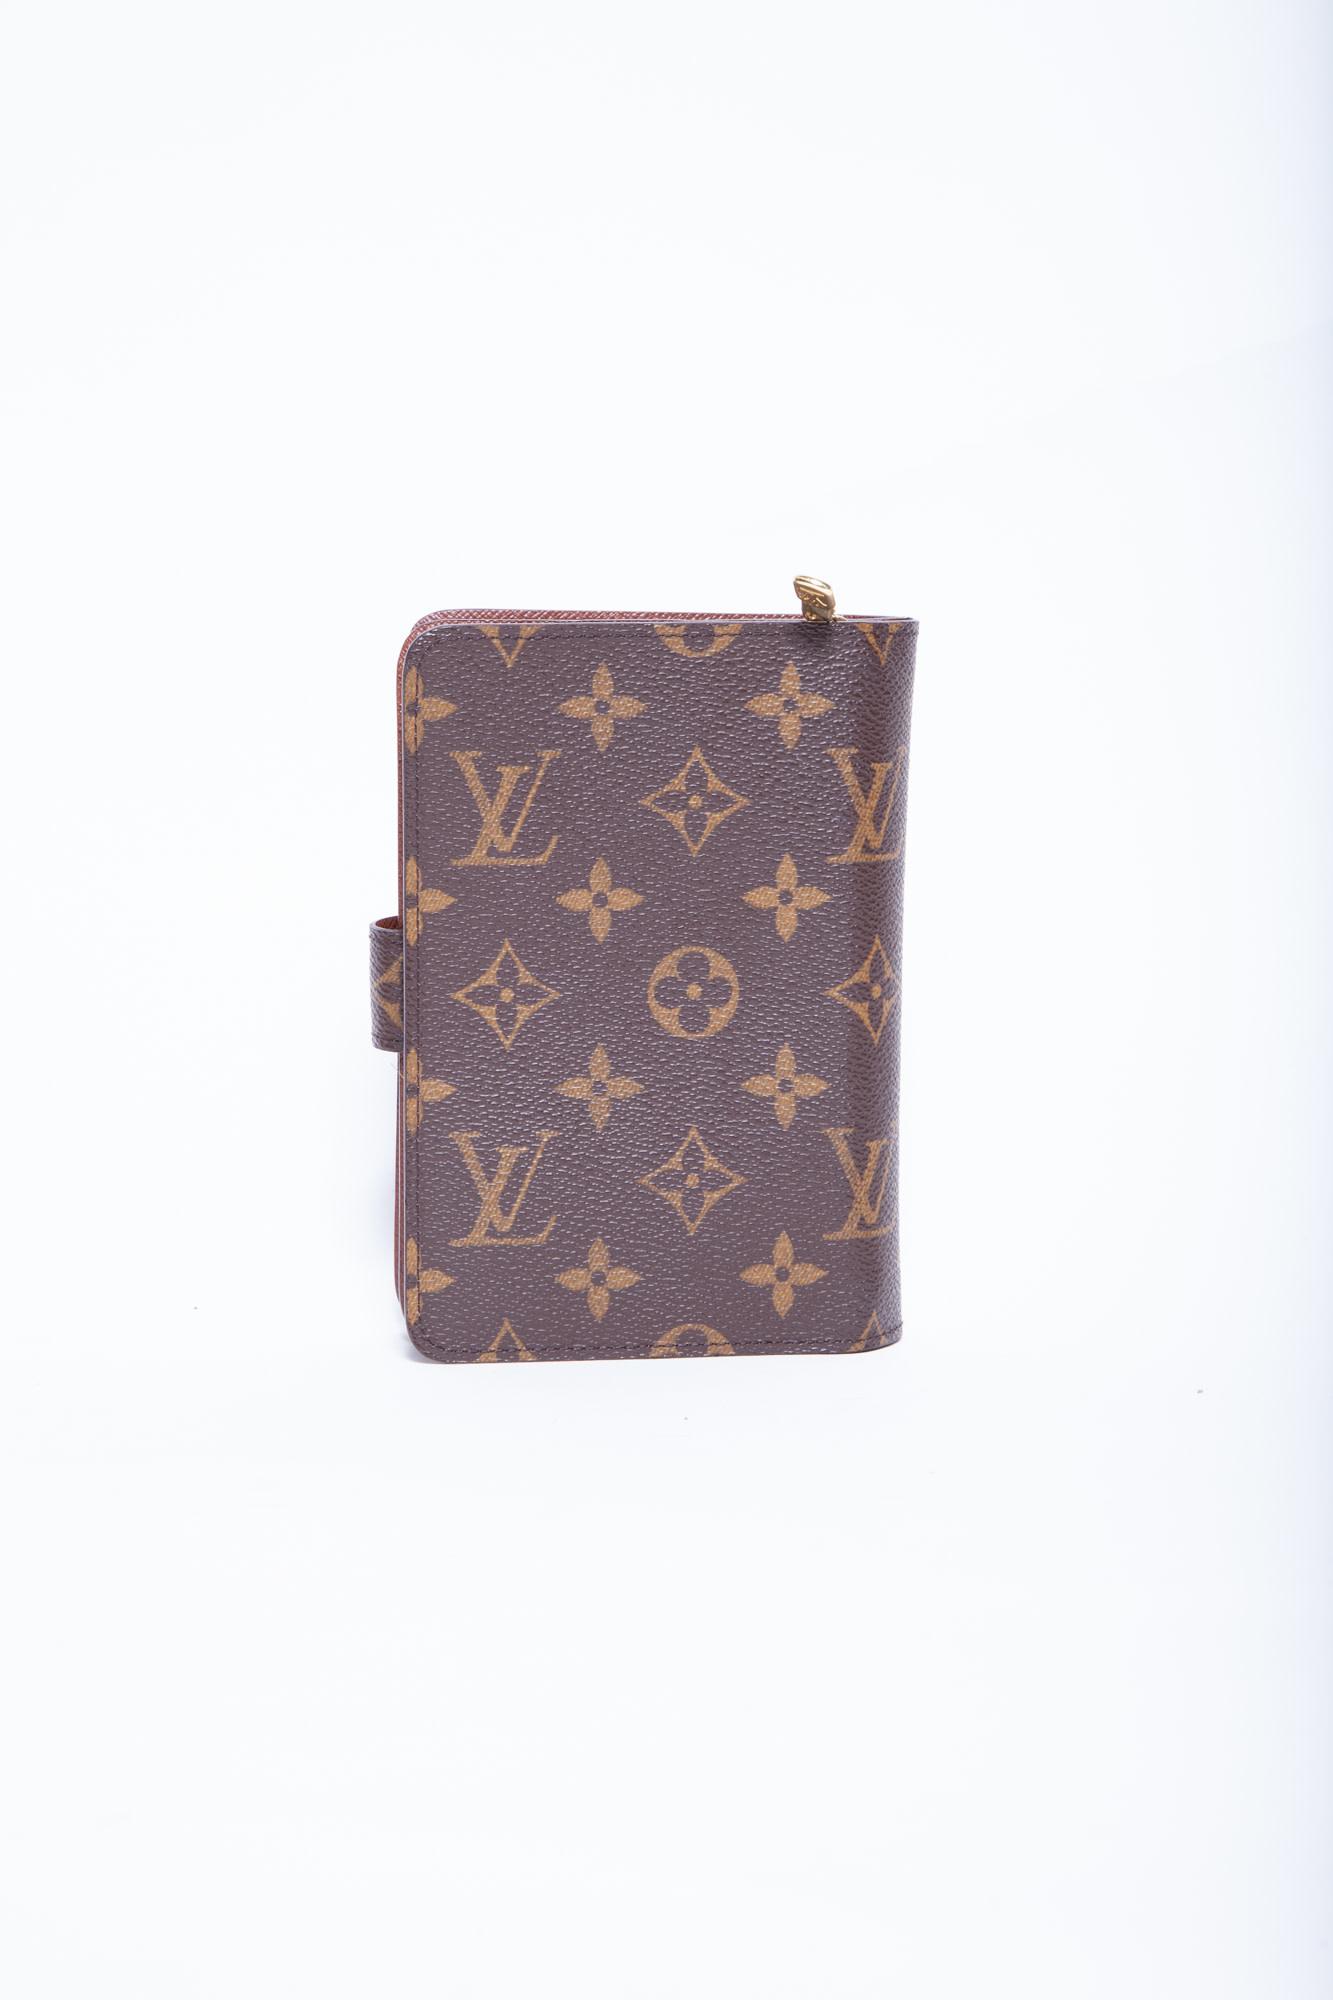 Louis Vuitton LOUIS VUITTON MONOGRAM WALLET